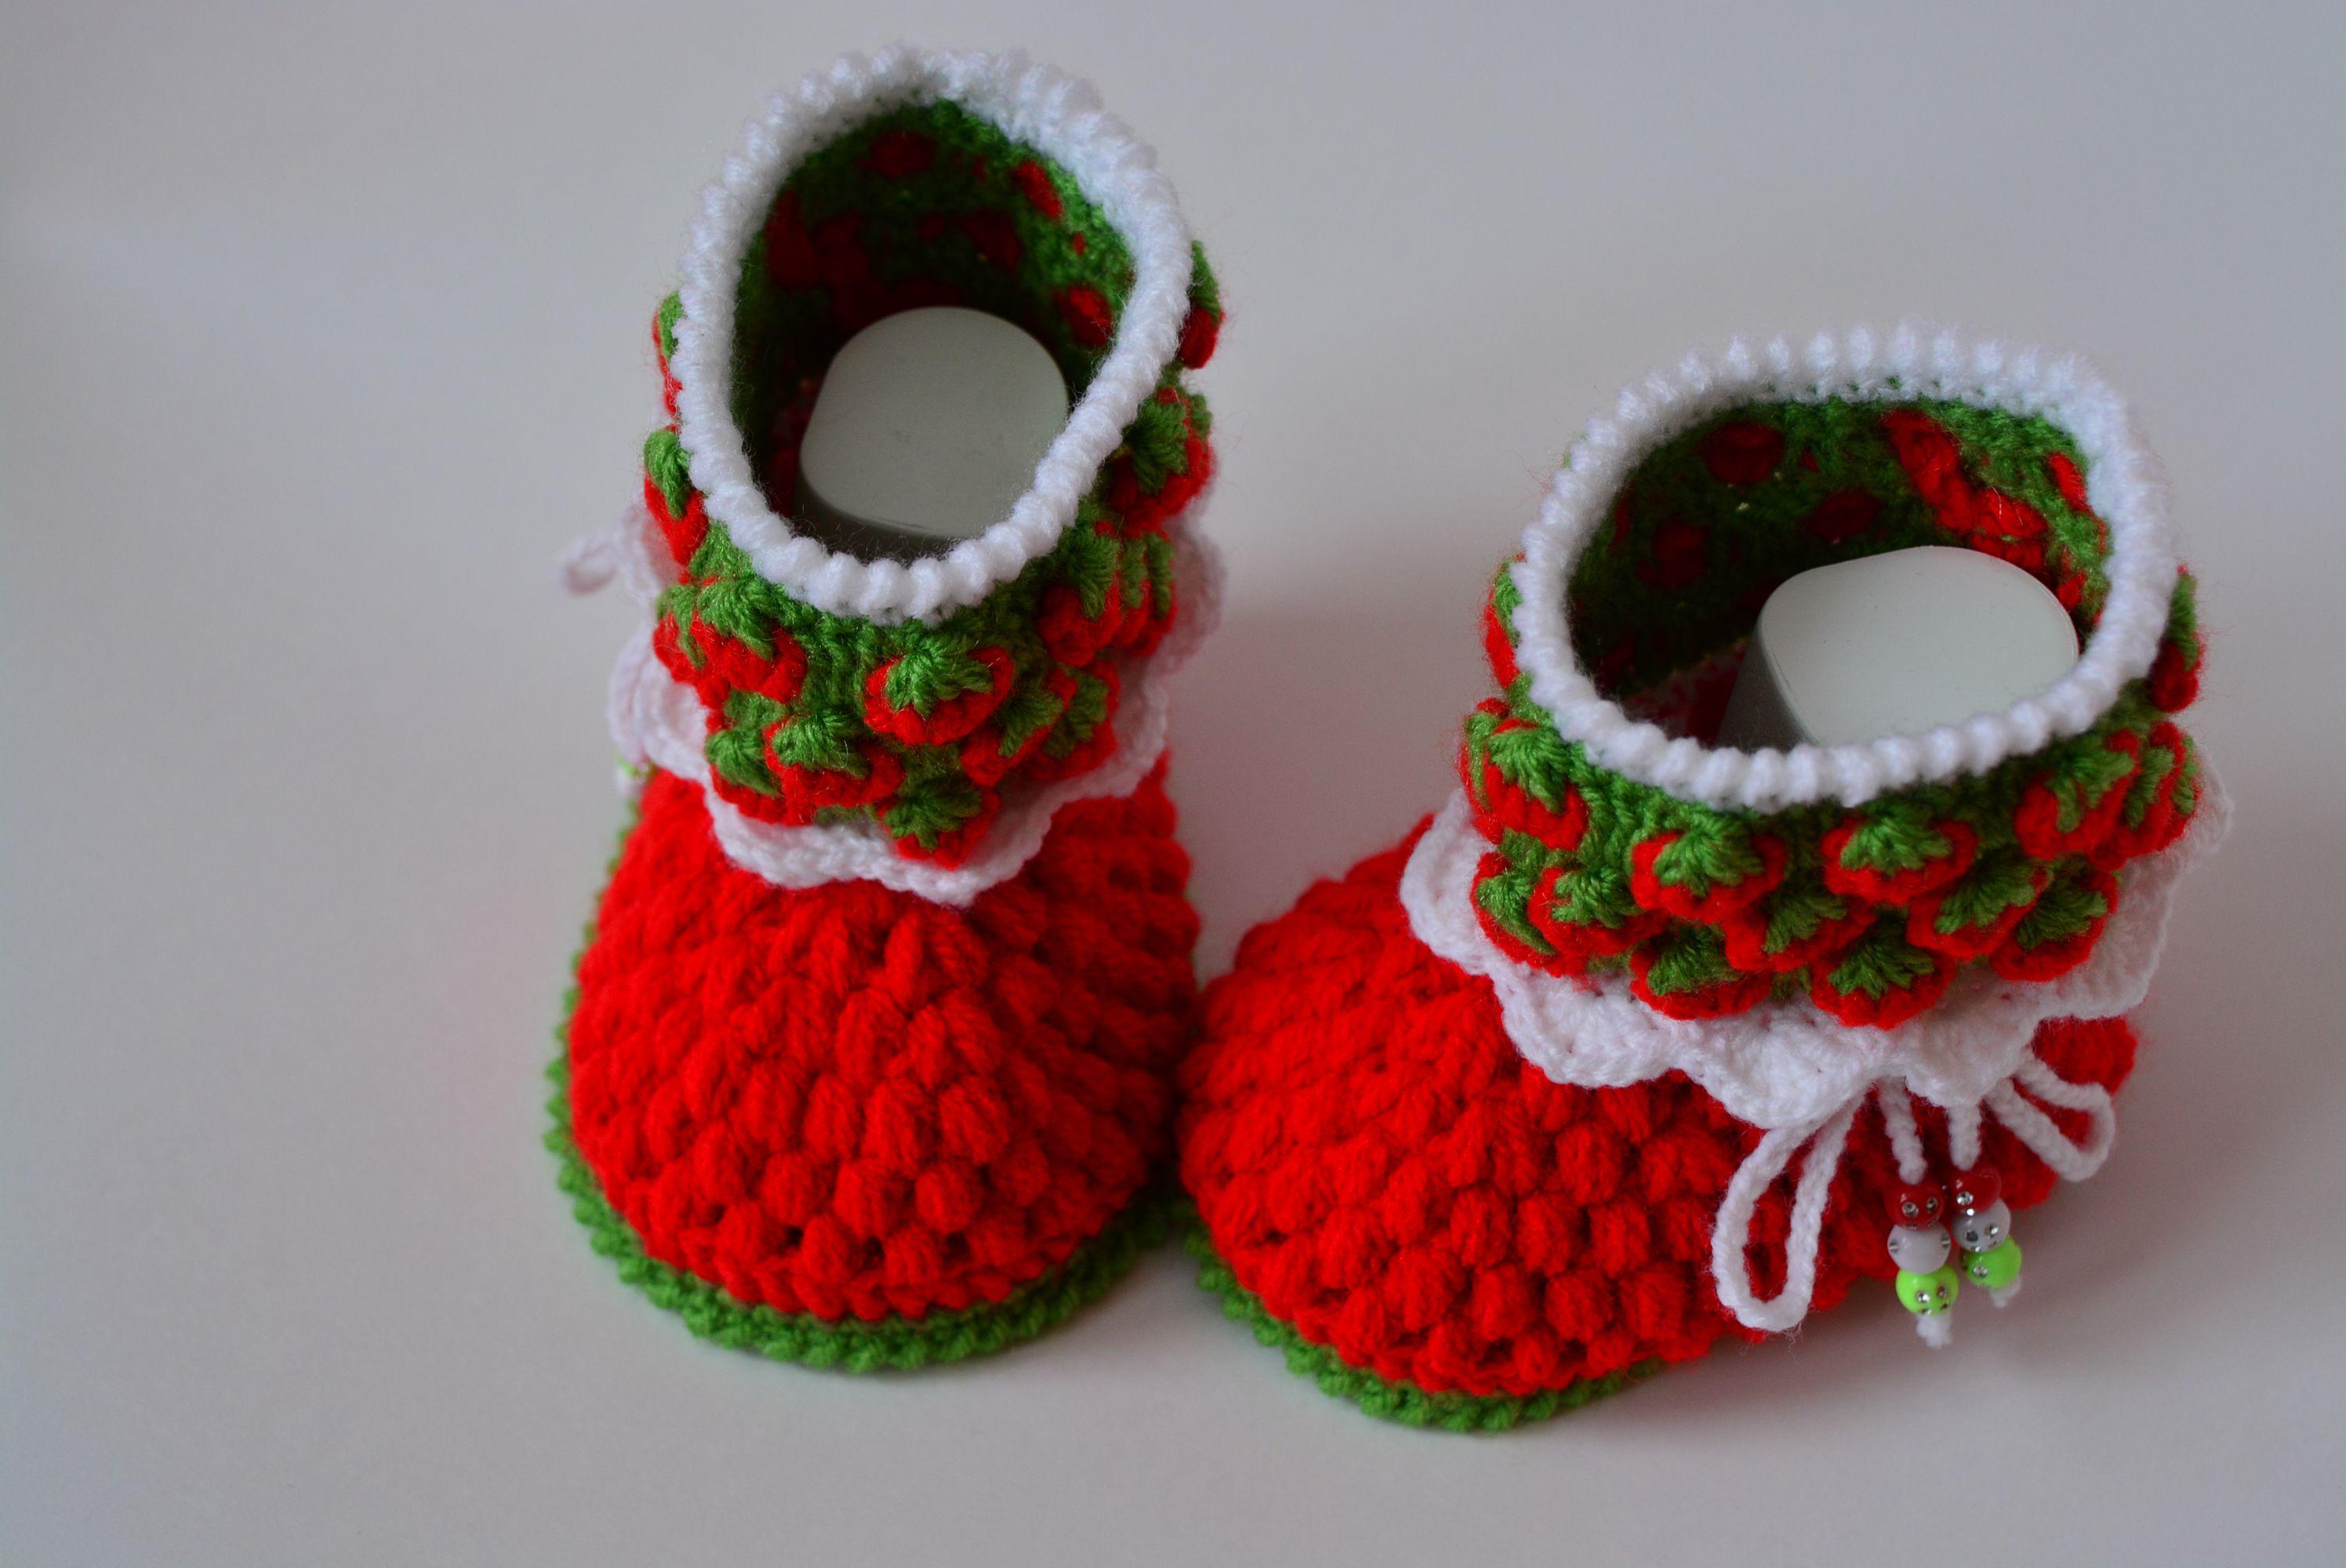 малышам крючком пинетки ботиночки